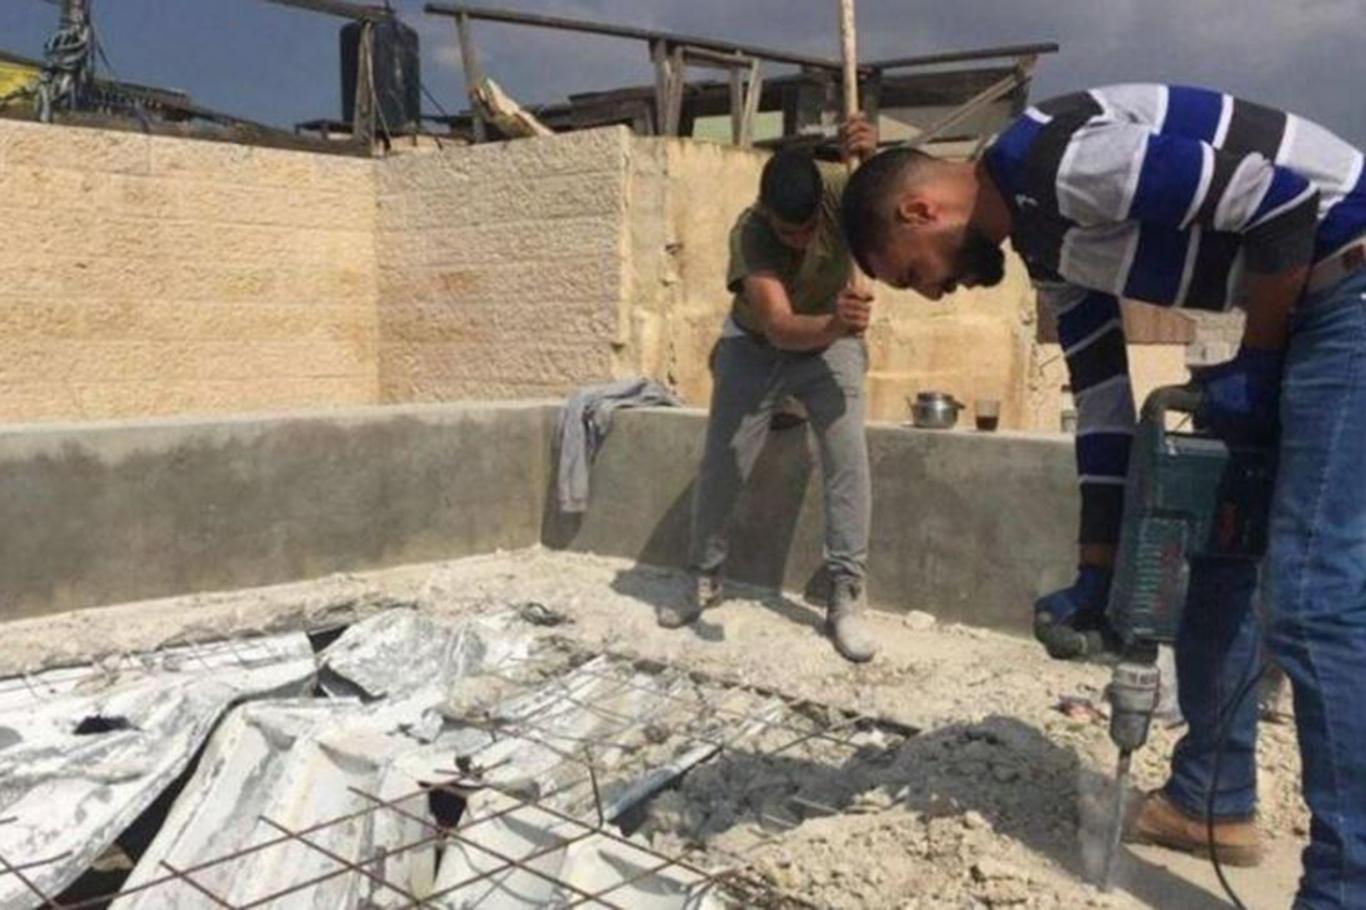 Jerusalemite Ali Shquairat self demolishing his home under the pretext of unpermitted work